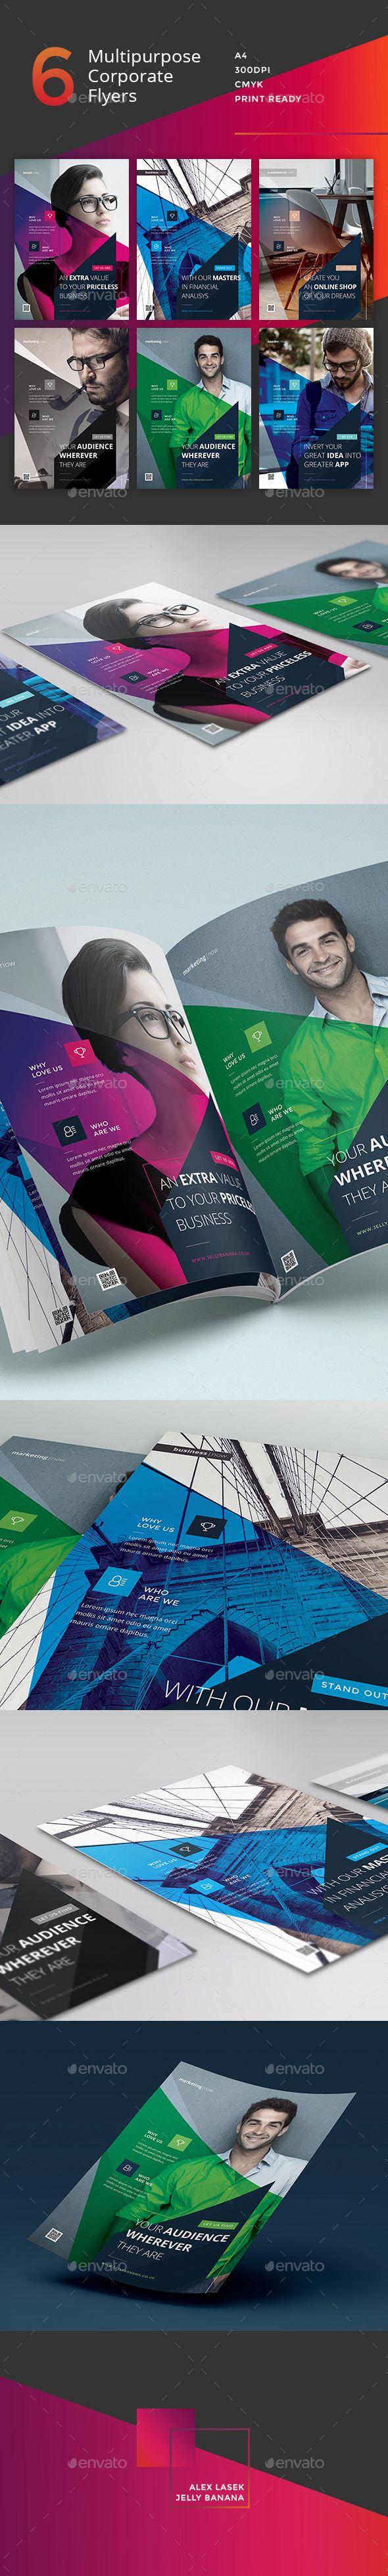 22 best Graphic Design Templates images on Pinterest